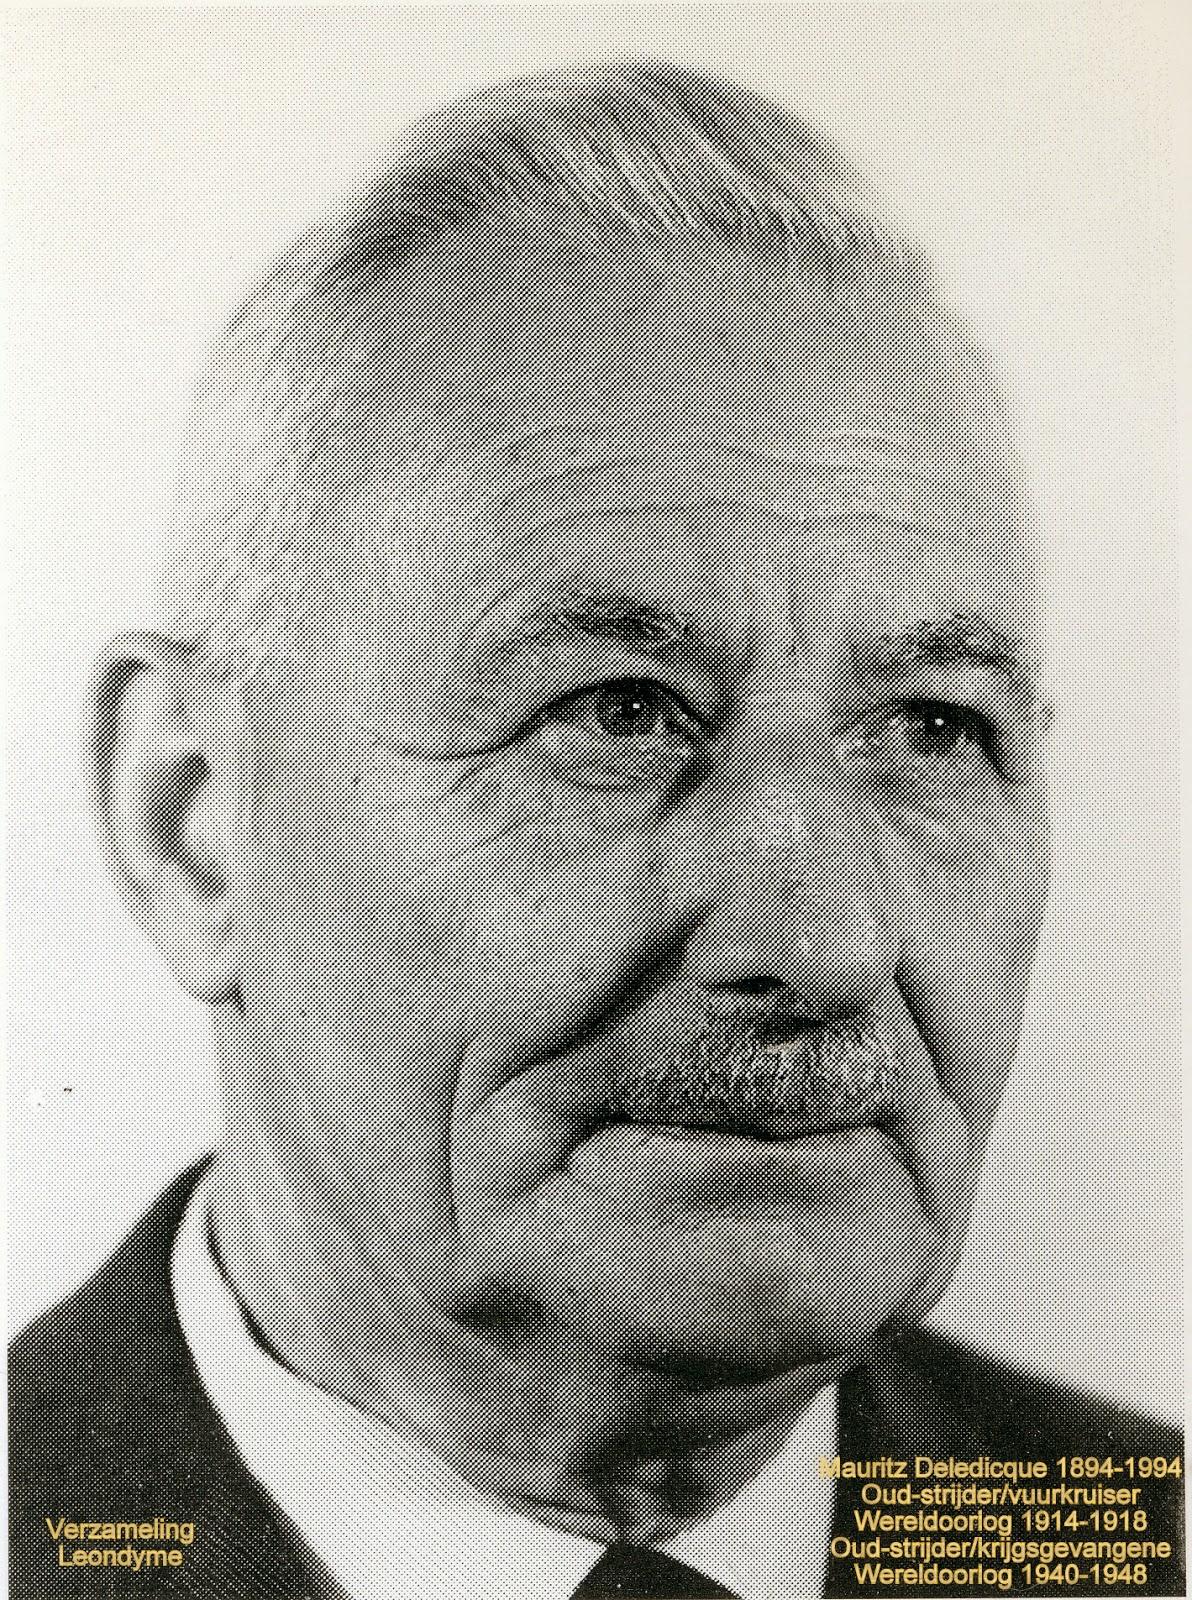 Bidprentje, Mauritz Deledicque 1894-1994.